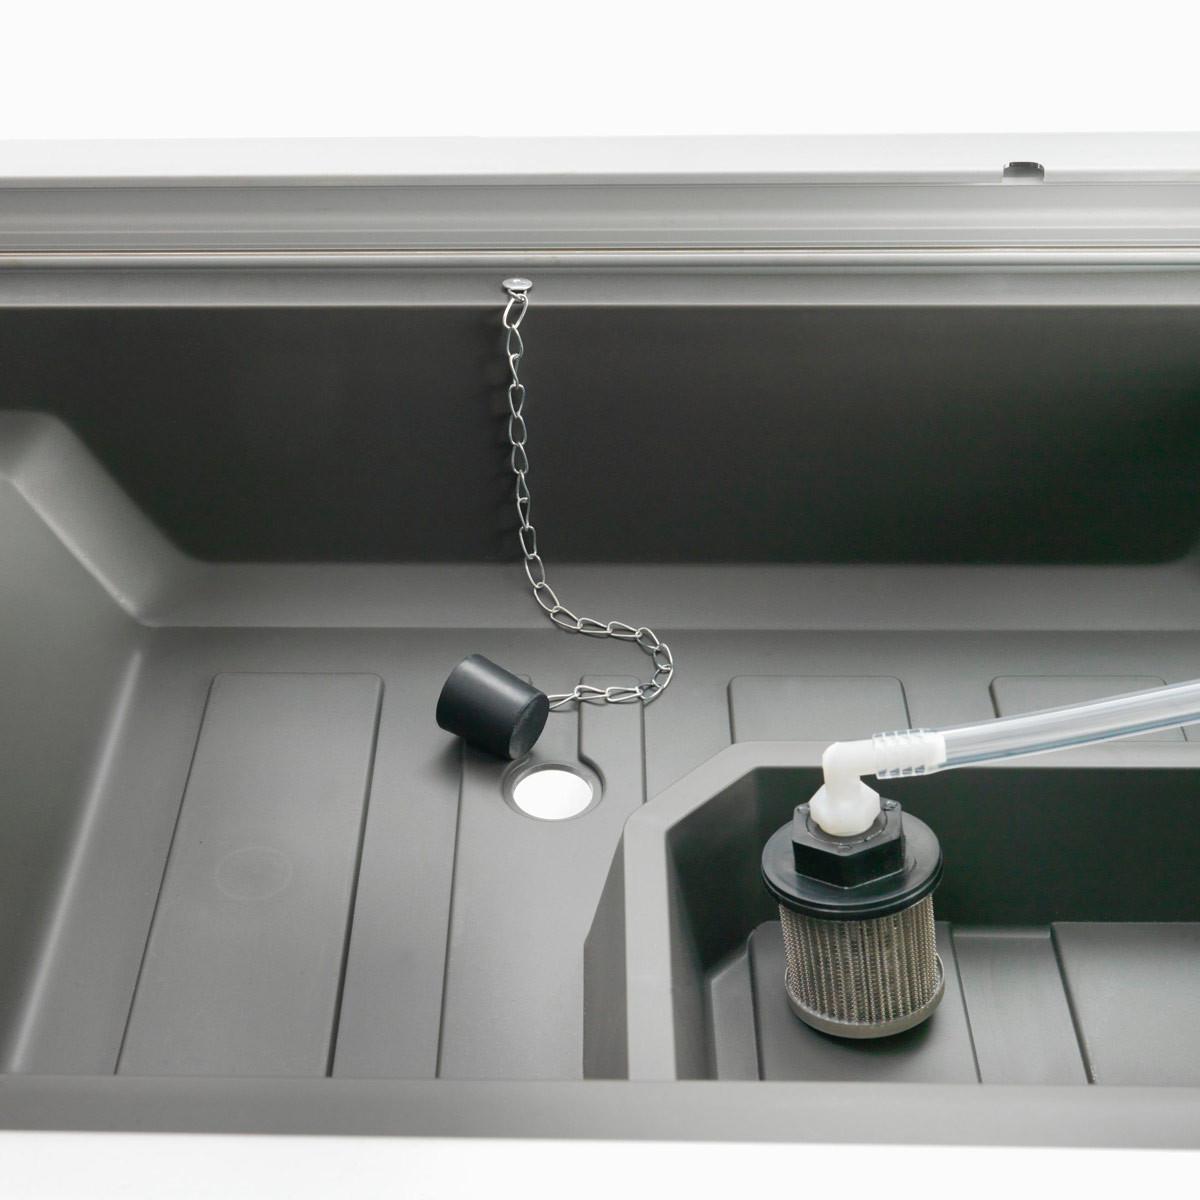 967285201 Husqvarna MS360 water pan